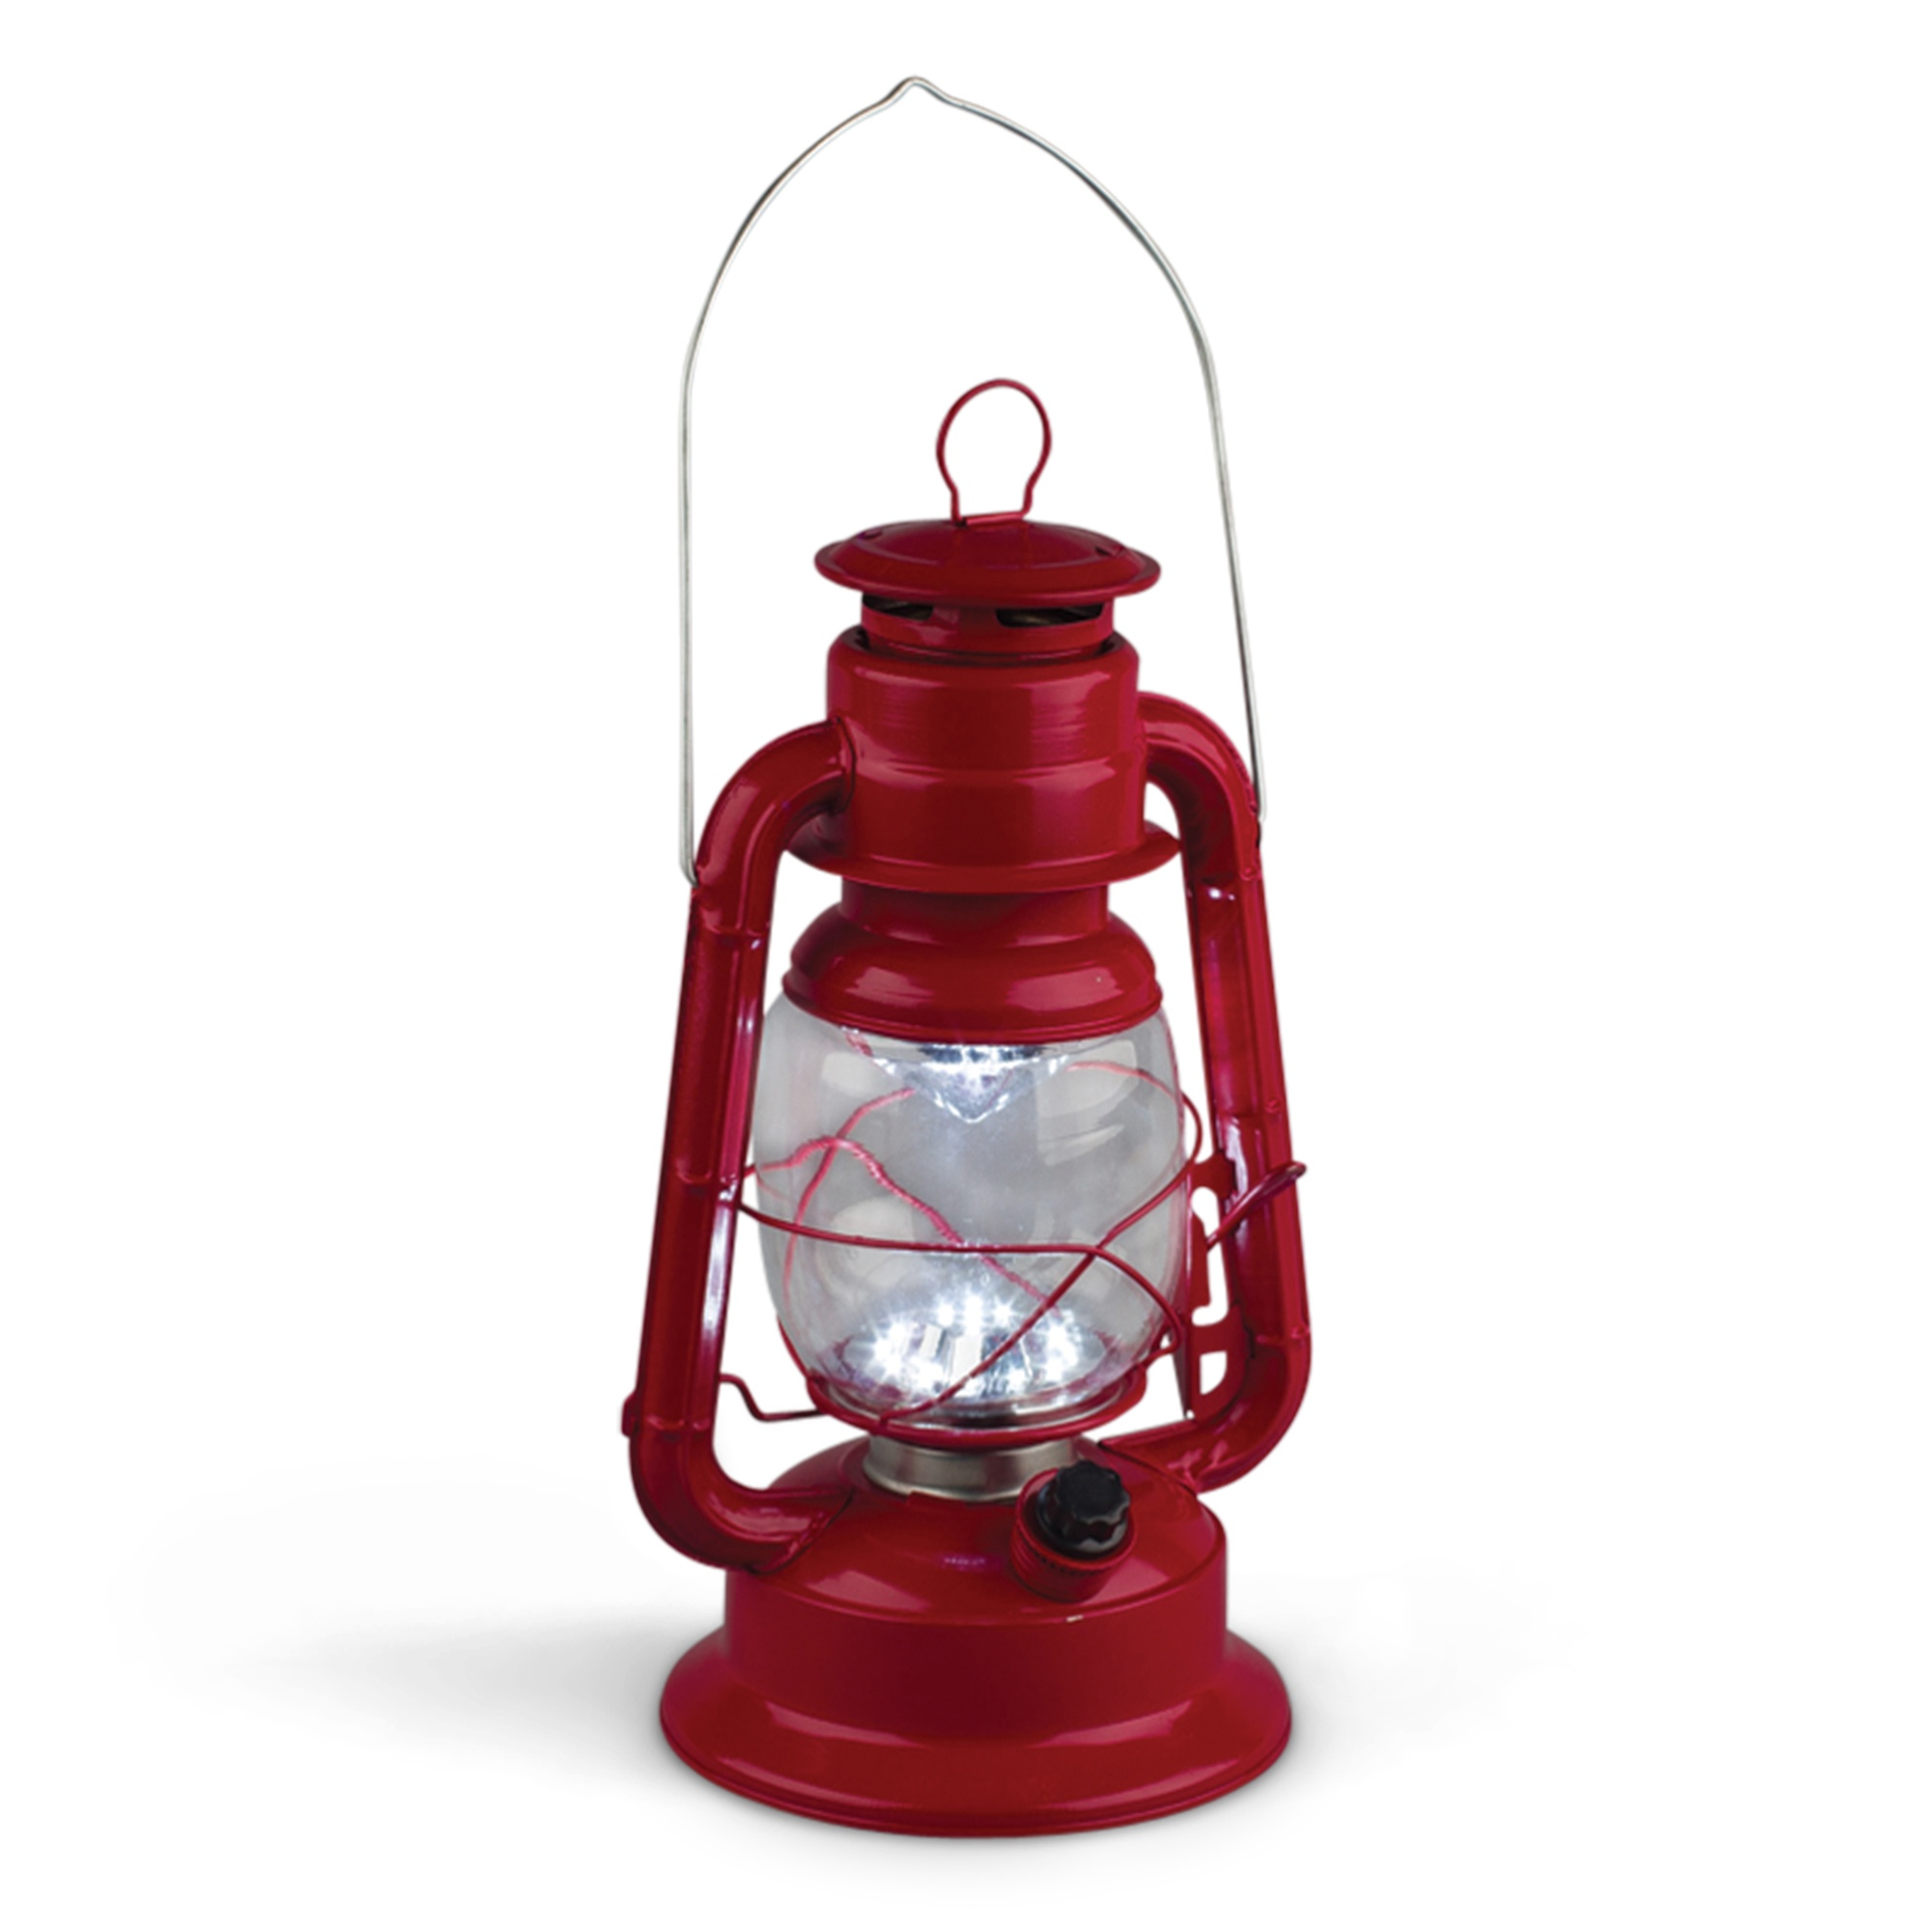 Red LED Hurricane Lantern - Yard Envy